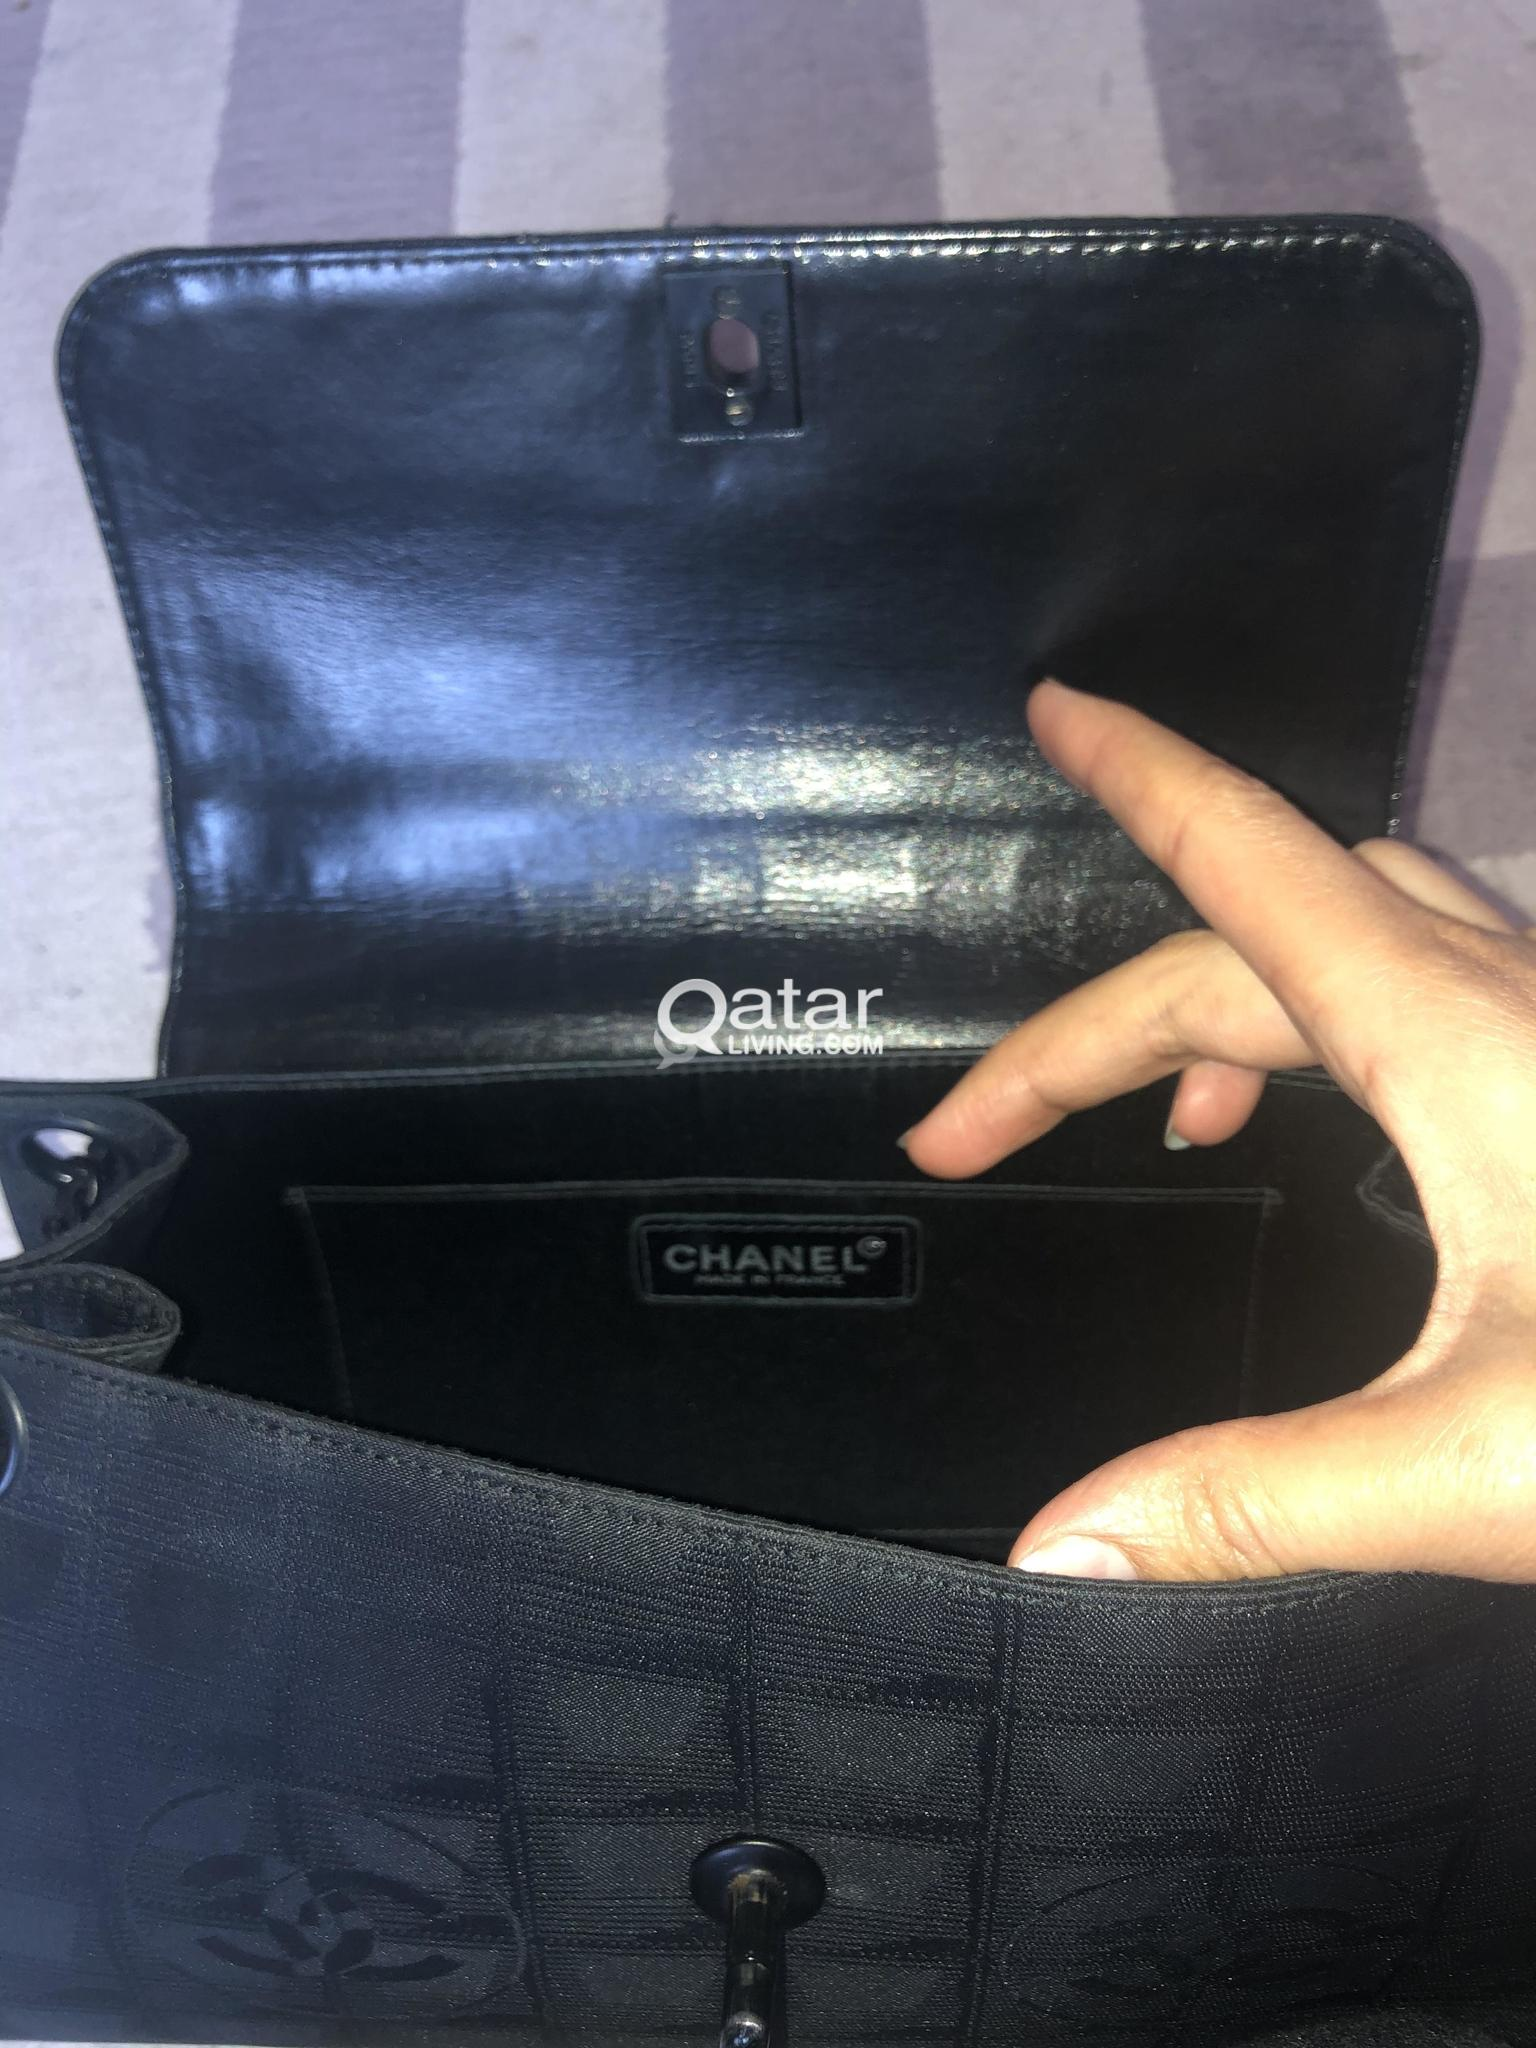 Vintage Chanel bag in excellent condition